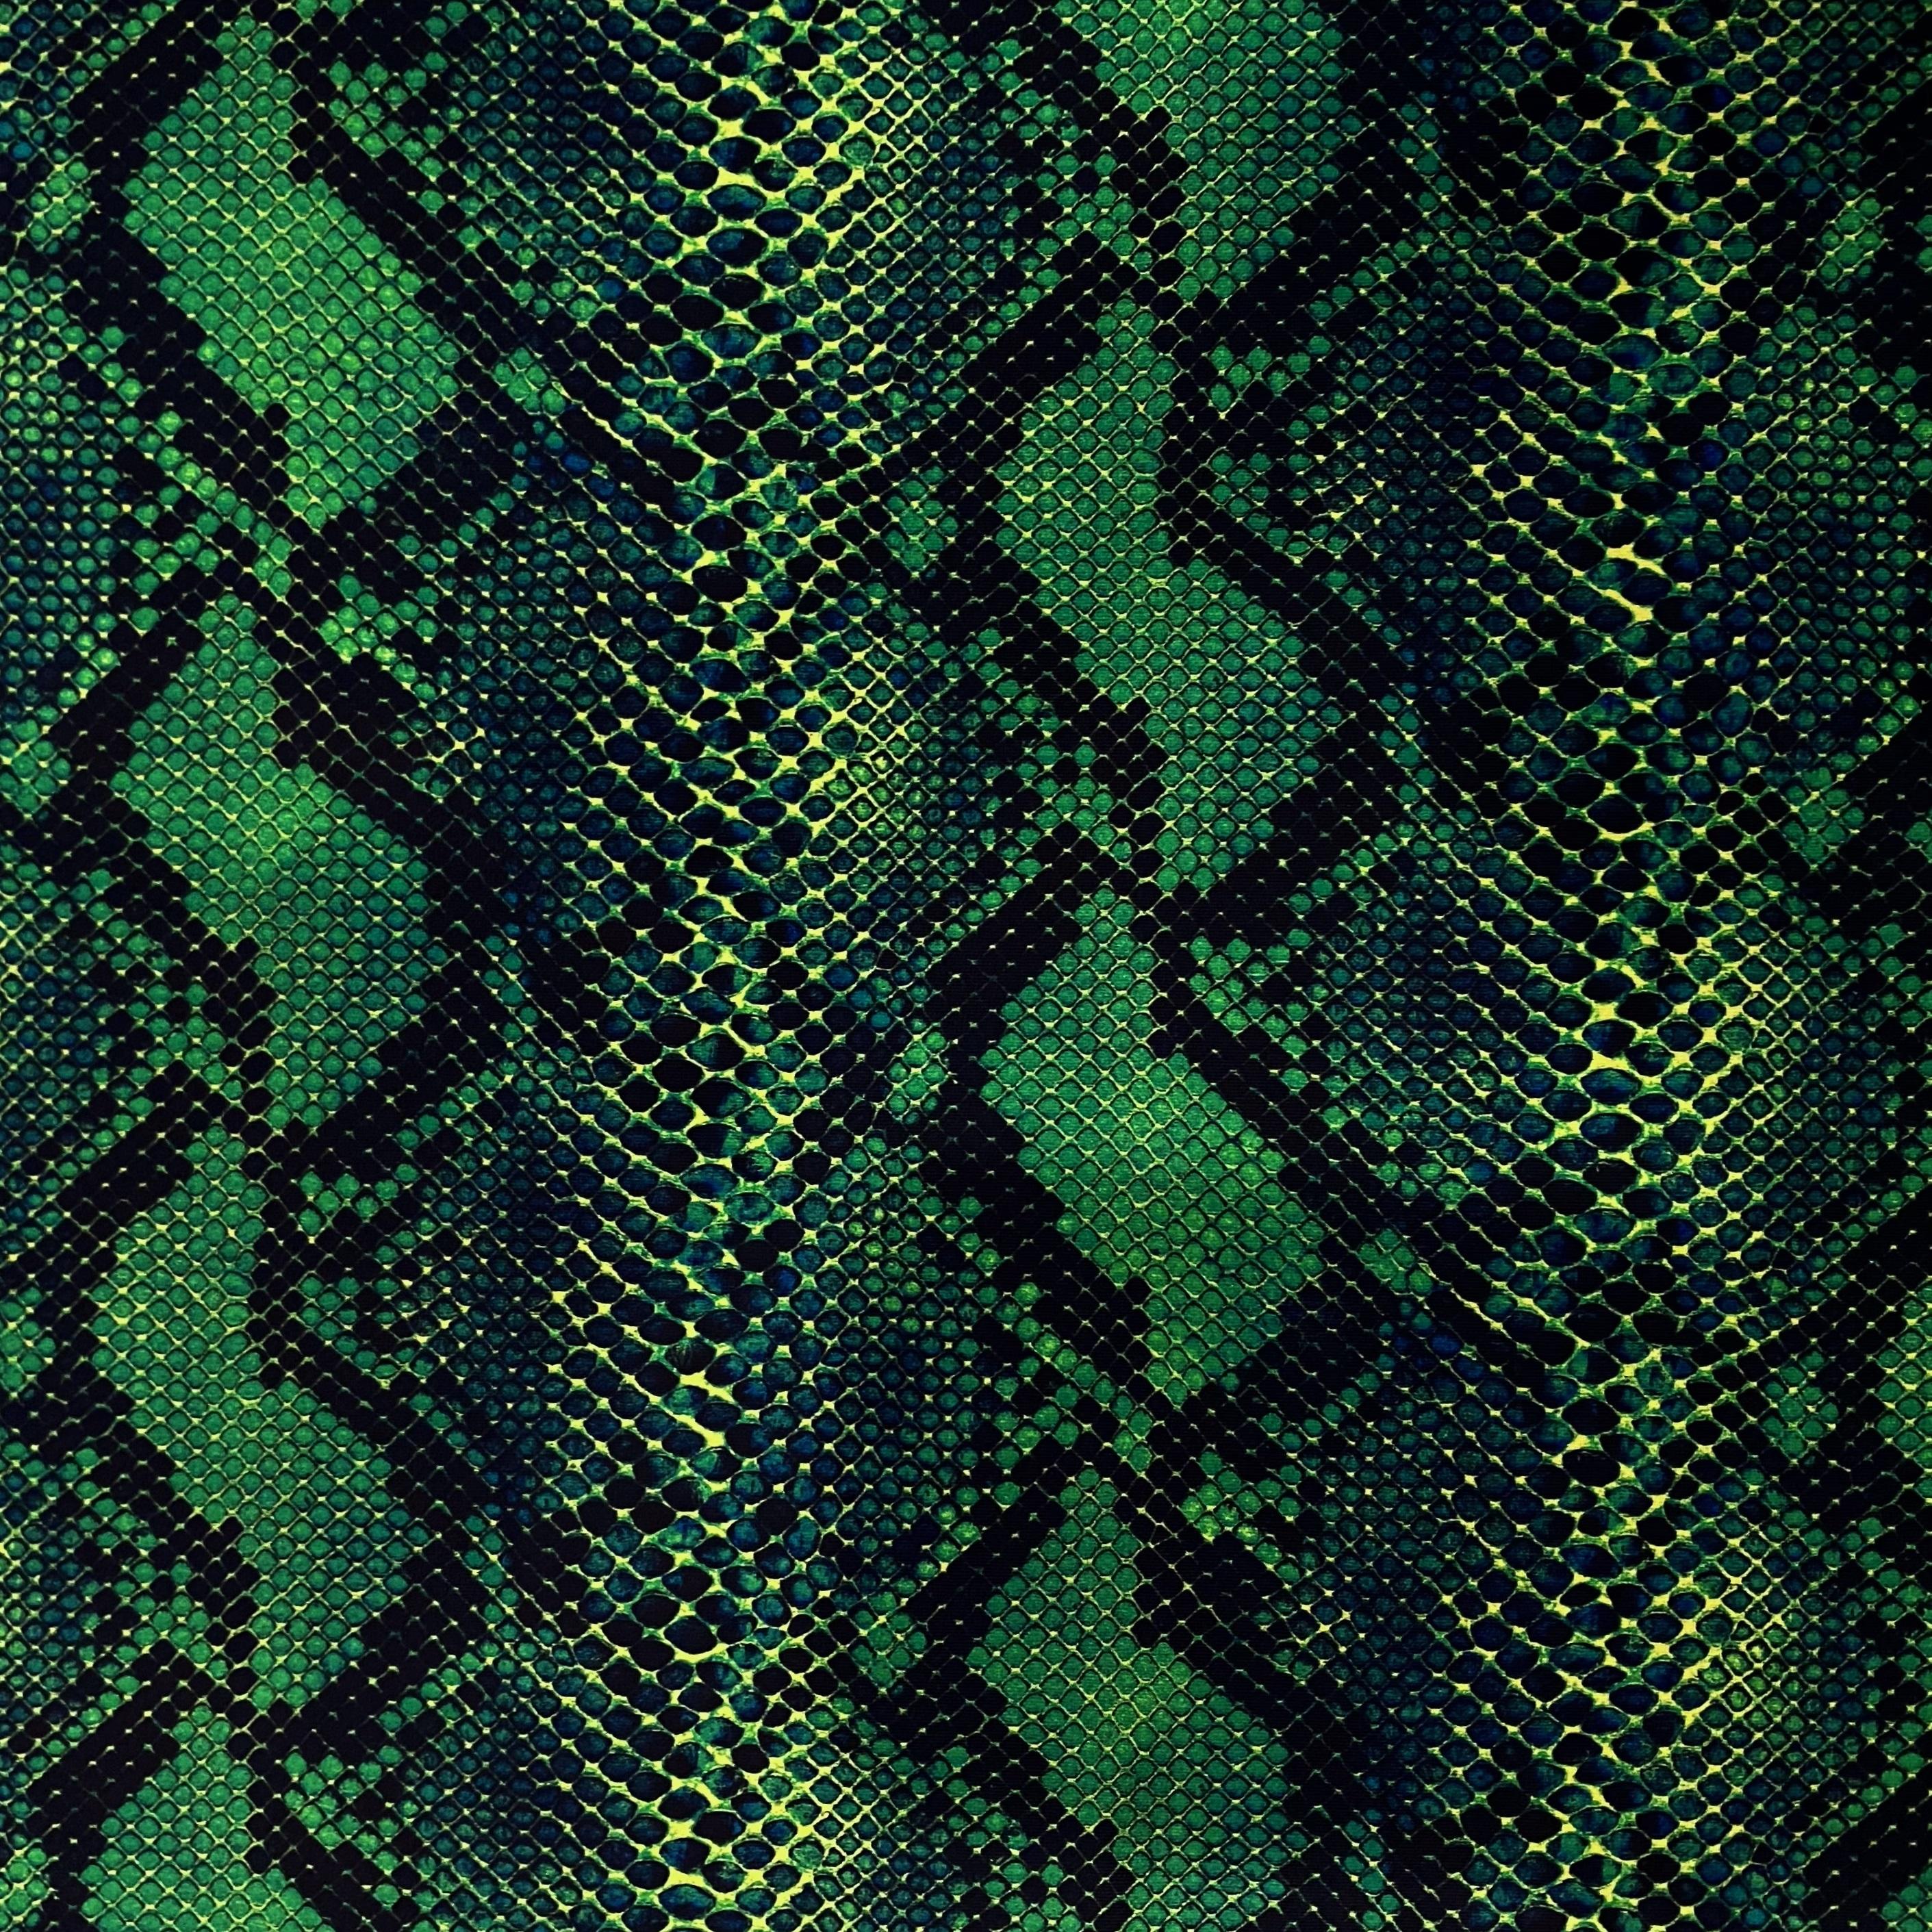 green-snakeskin-cropped-roto.jpeg